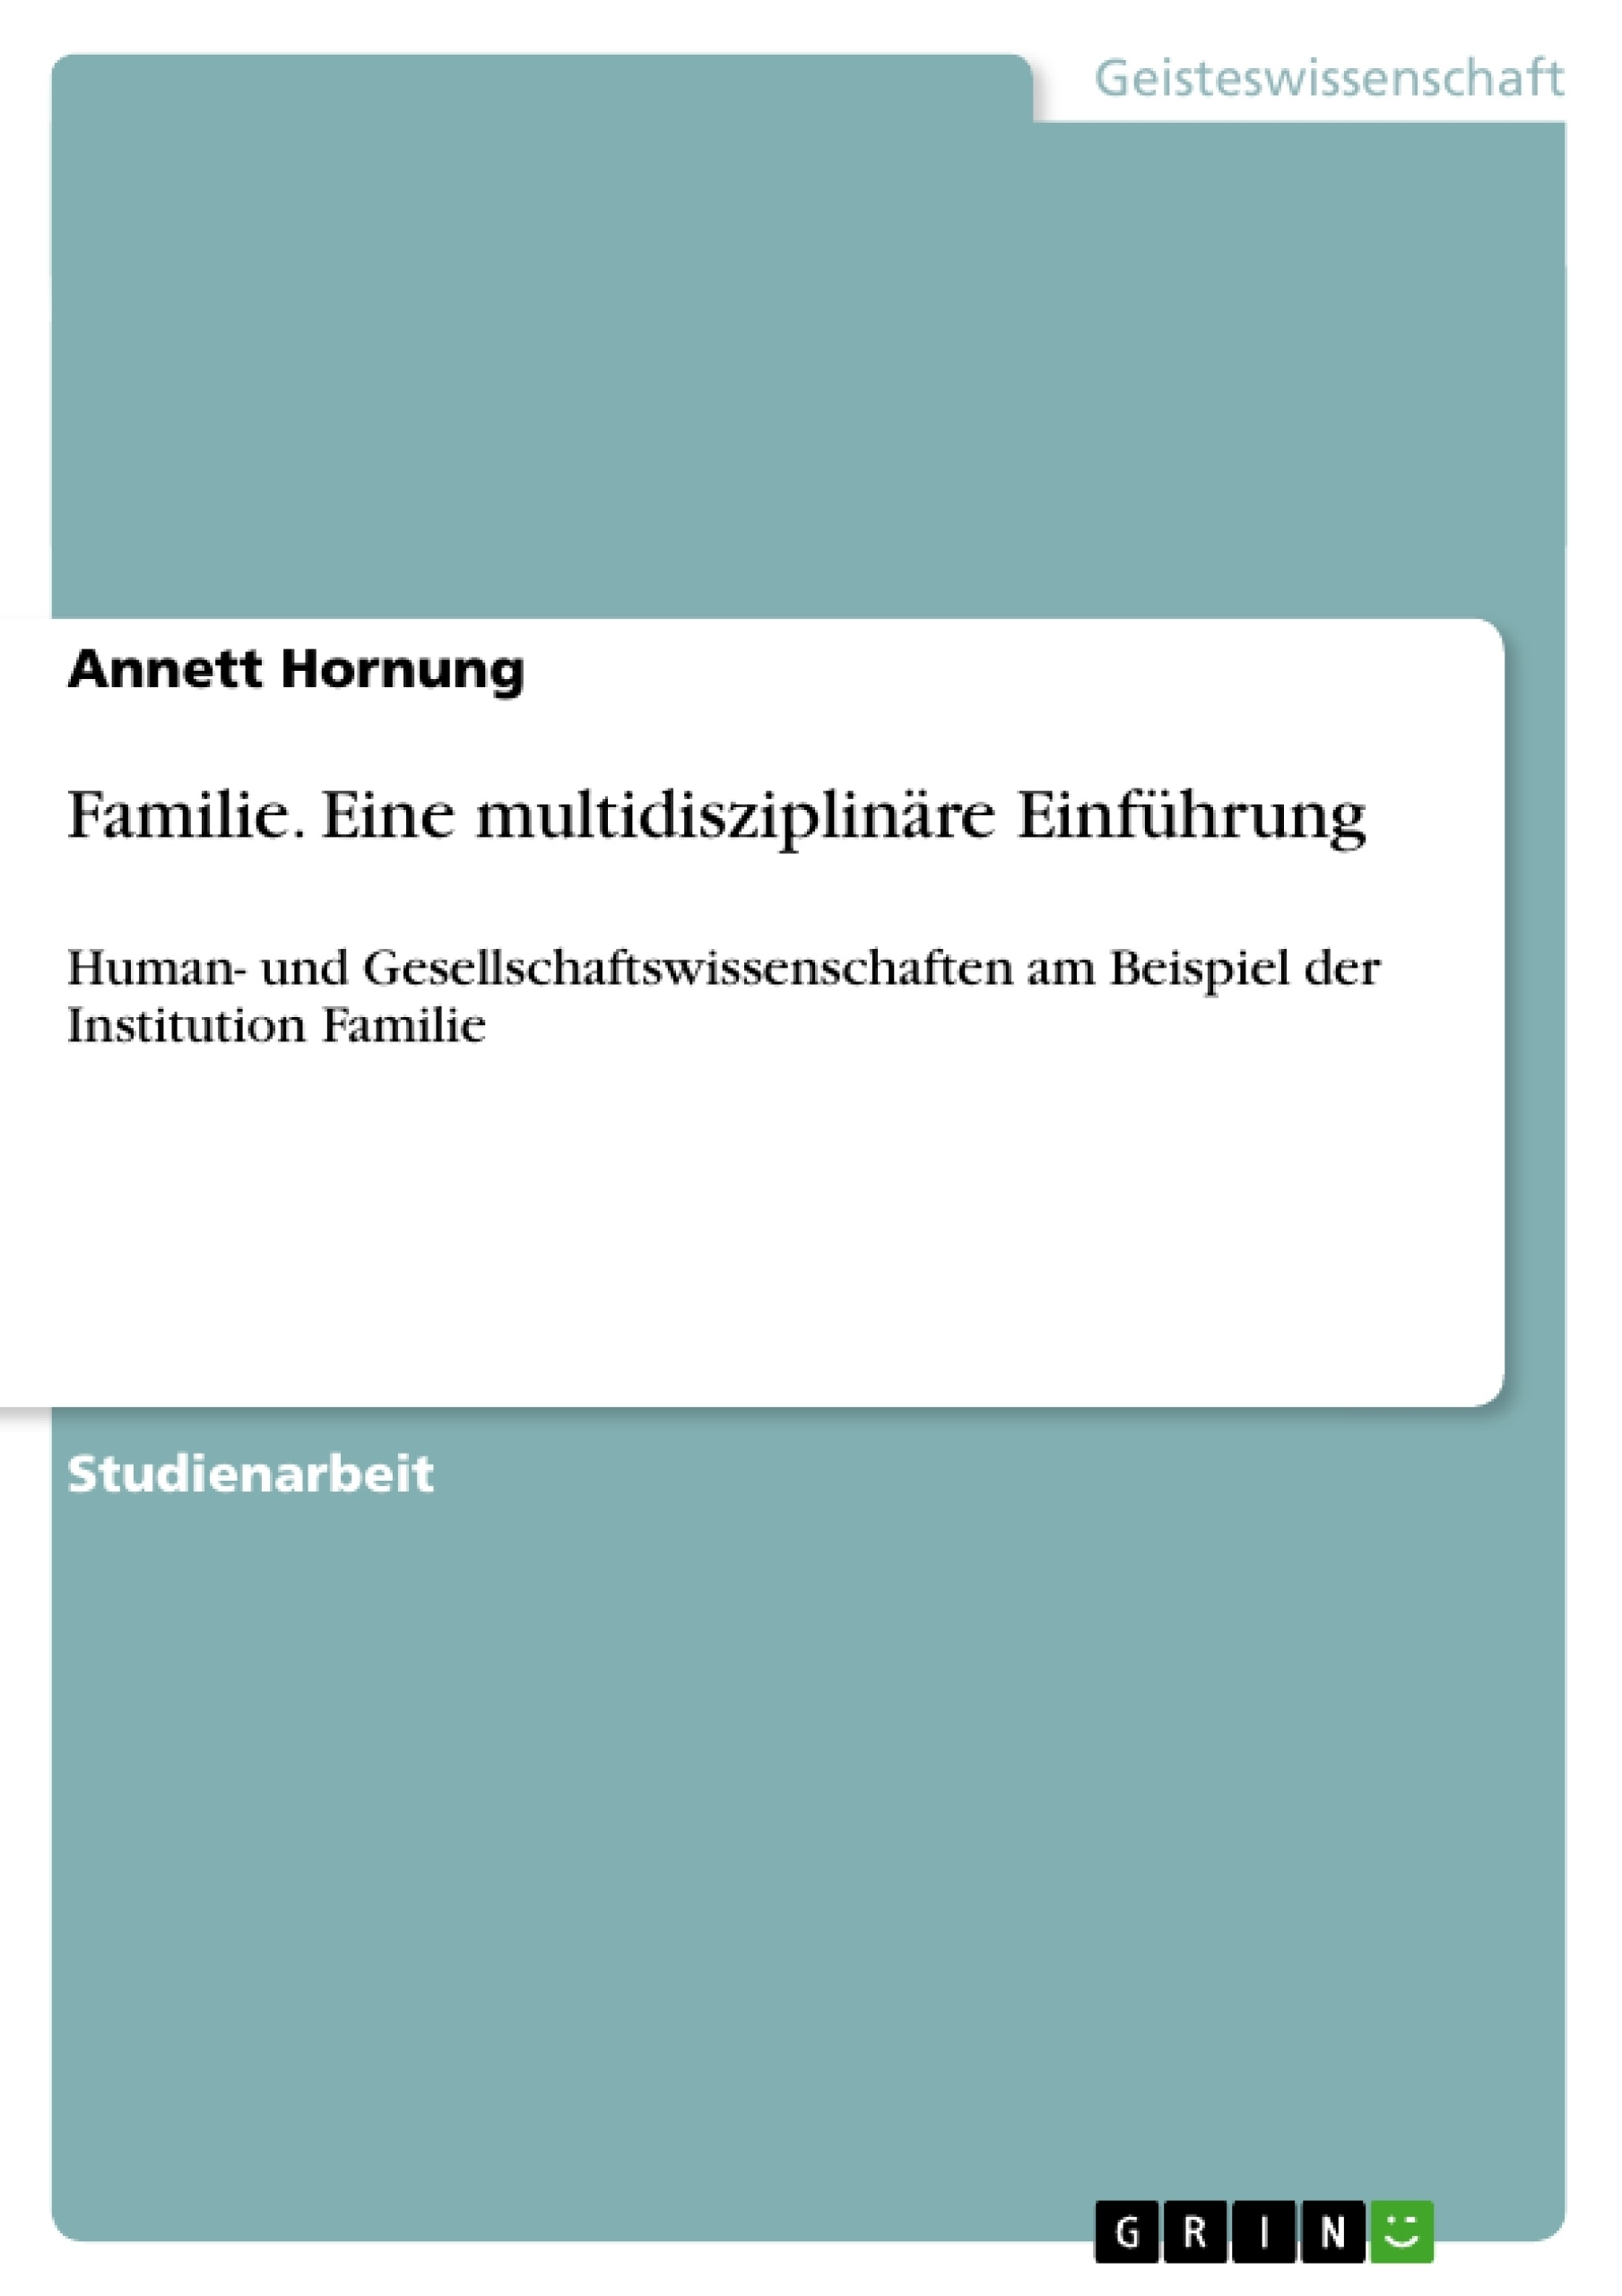 Titel: Familie. Eine multidisziplinäre Einführung